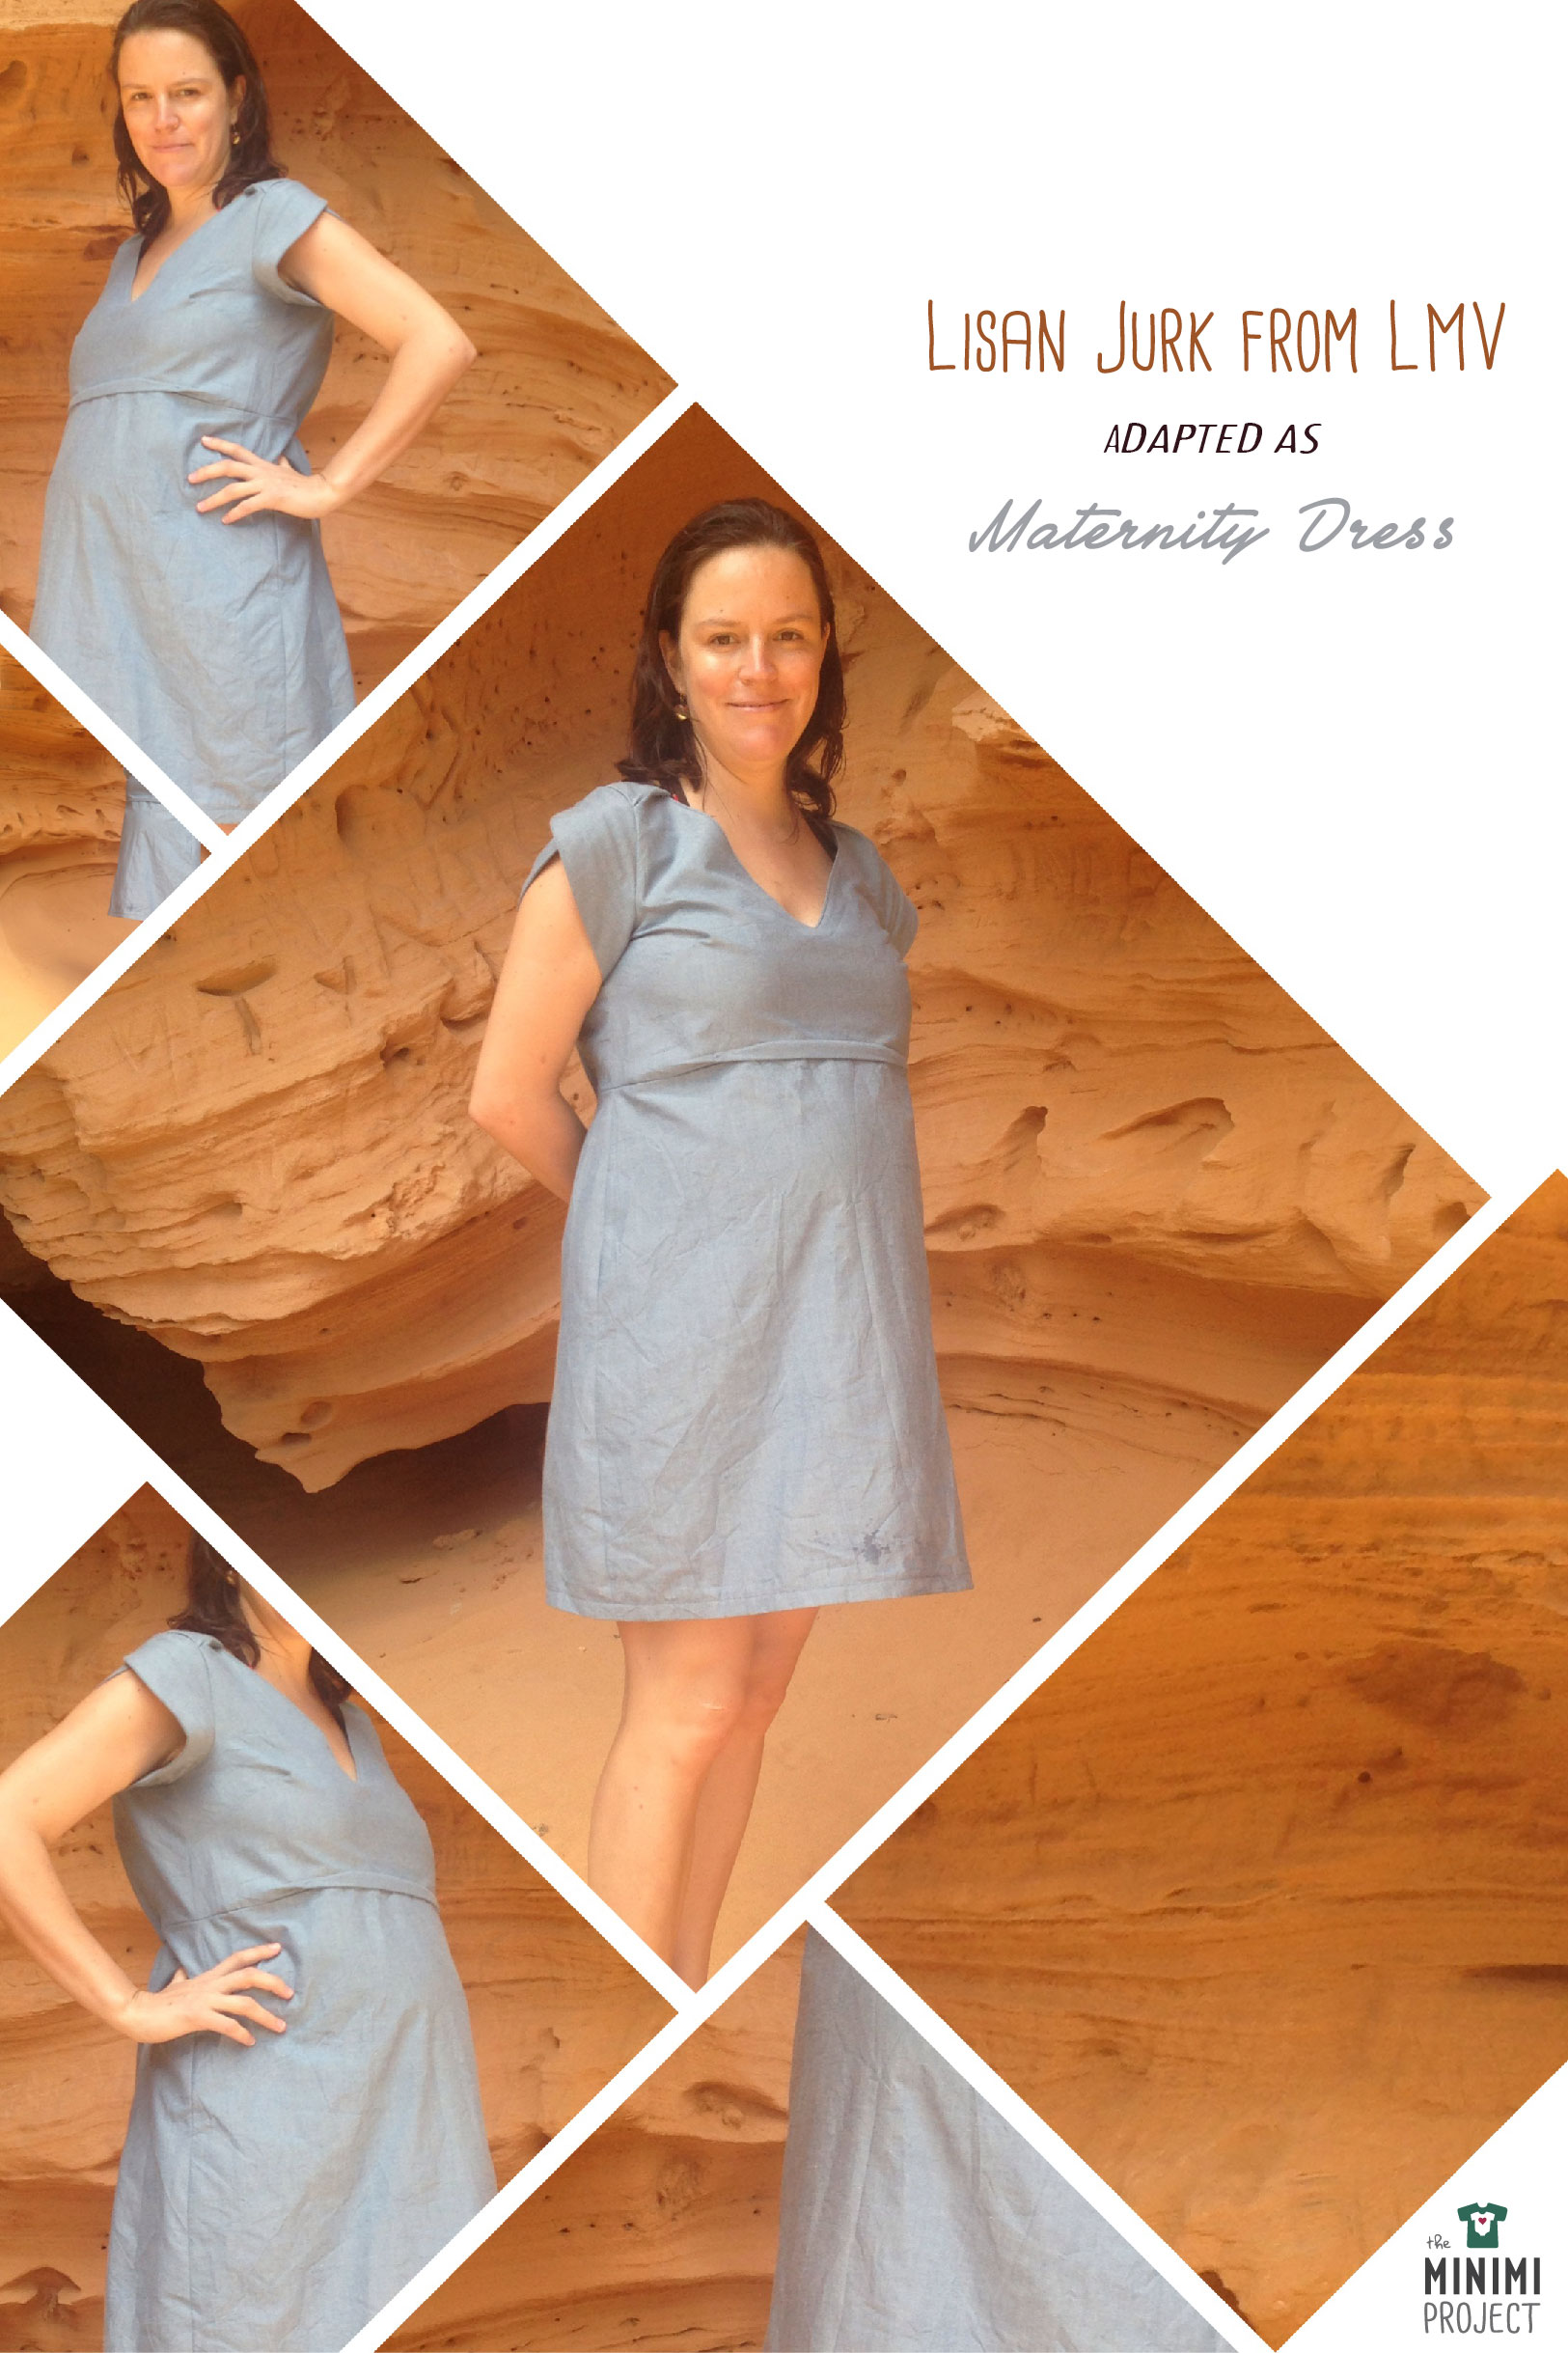 Lisan Jurk Maternity Dress